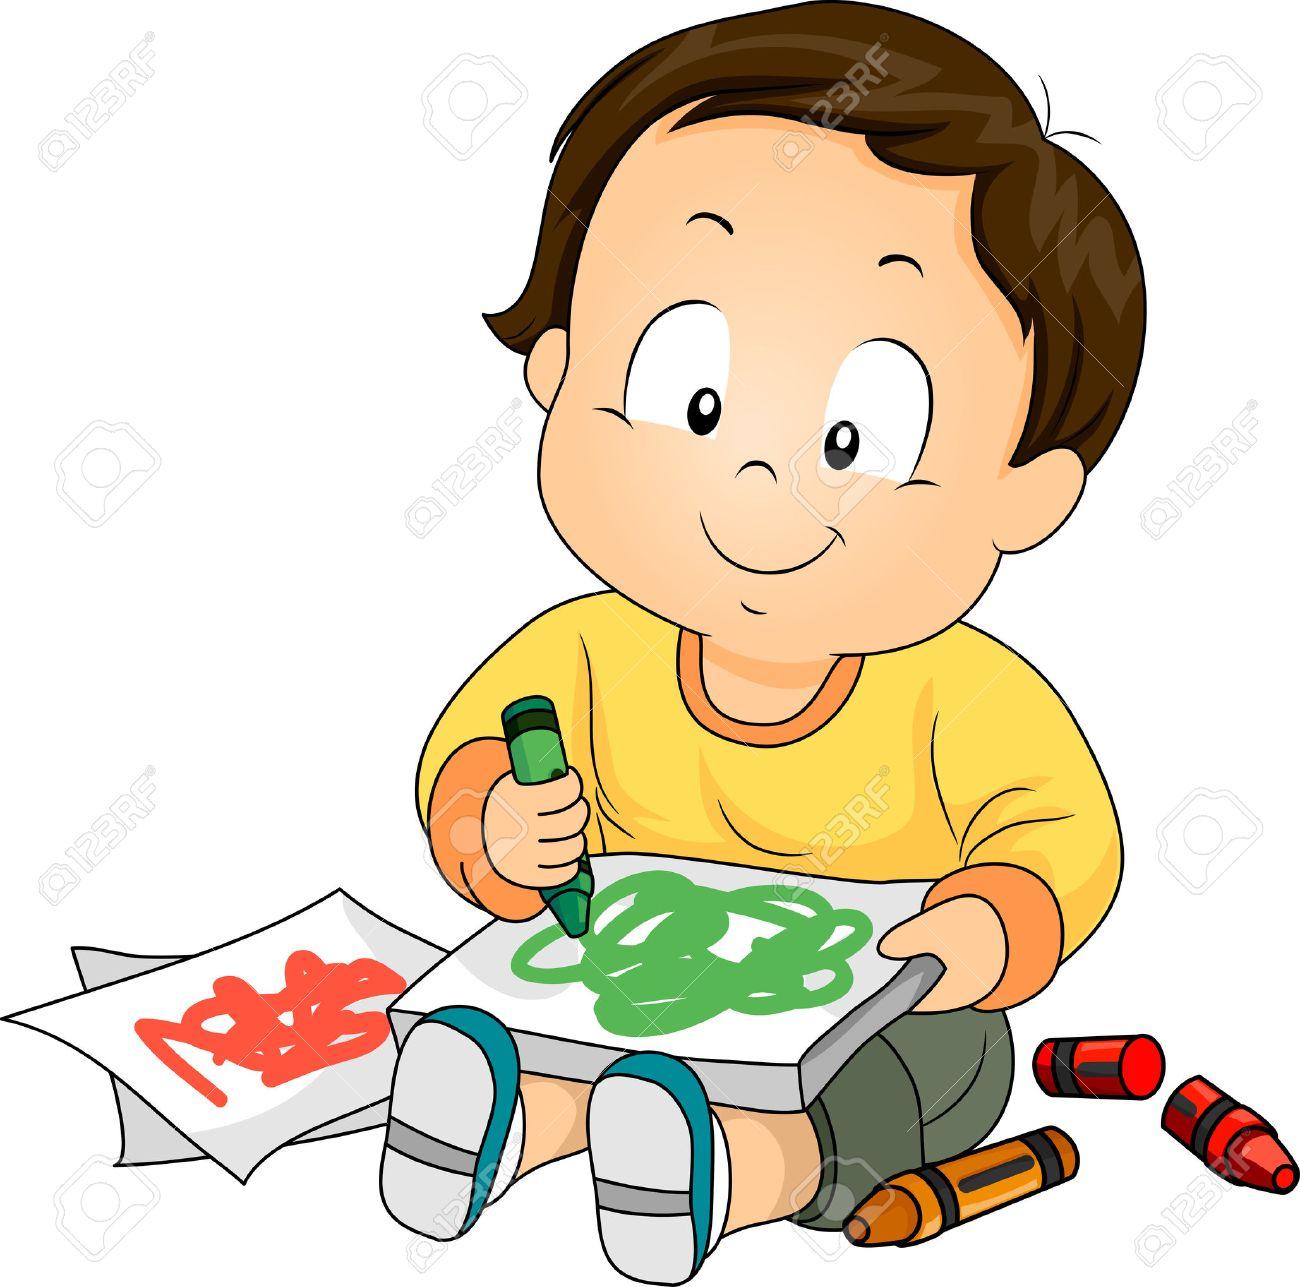 Dessin Bébé Garçon illustration d'un bébé garçon dessin doodles avec crayons banque d